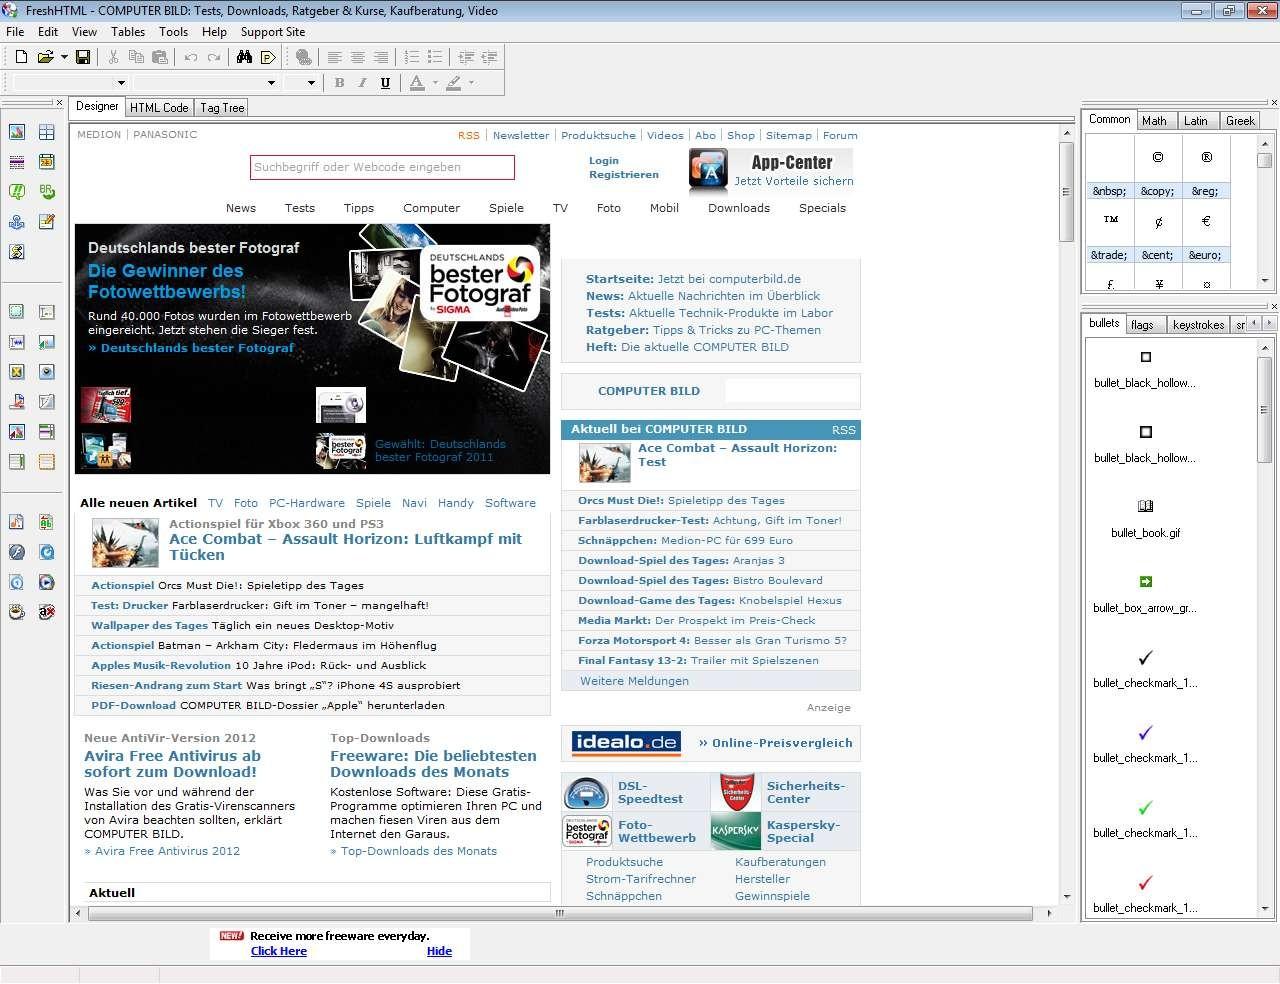 Screenshot 1 - Fresh HTML